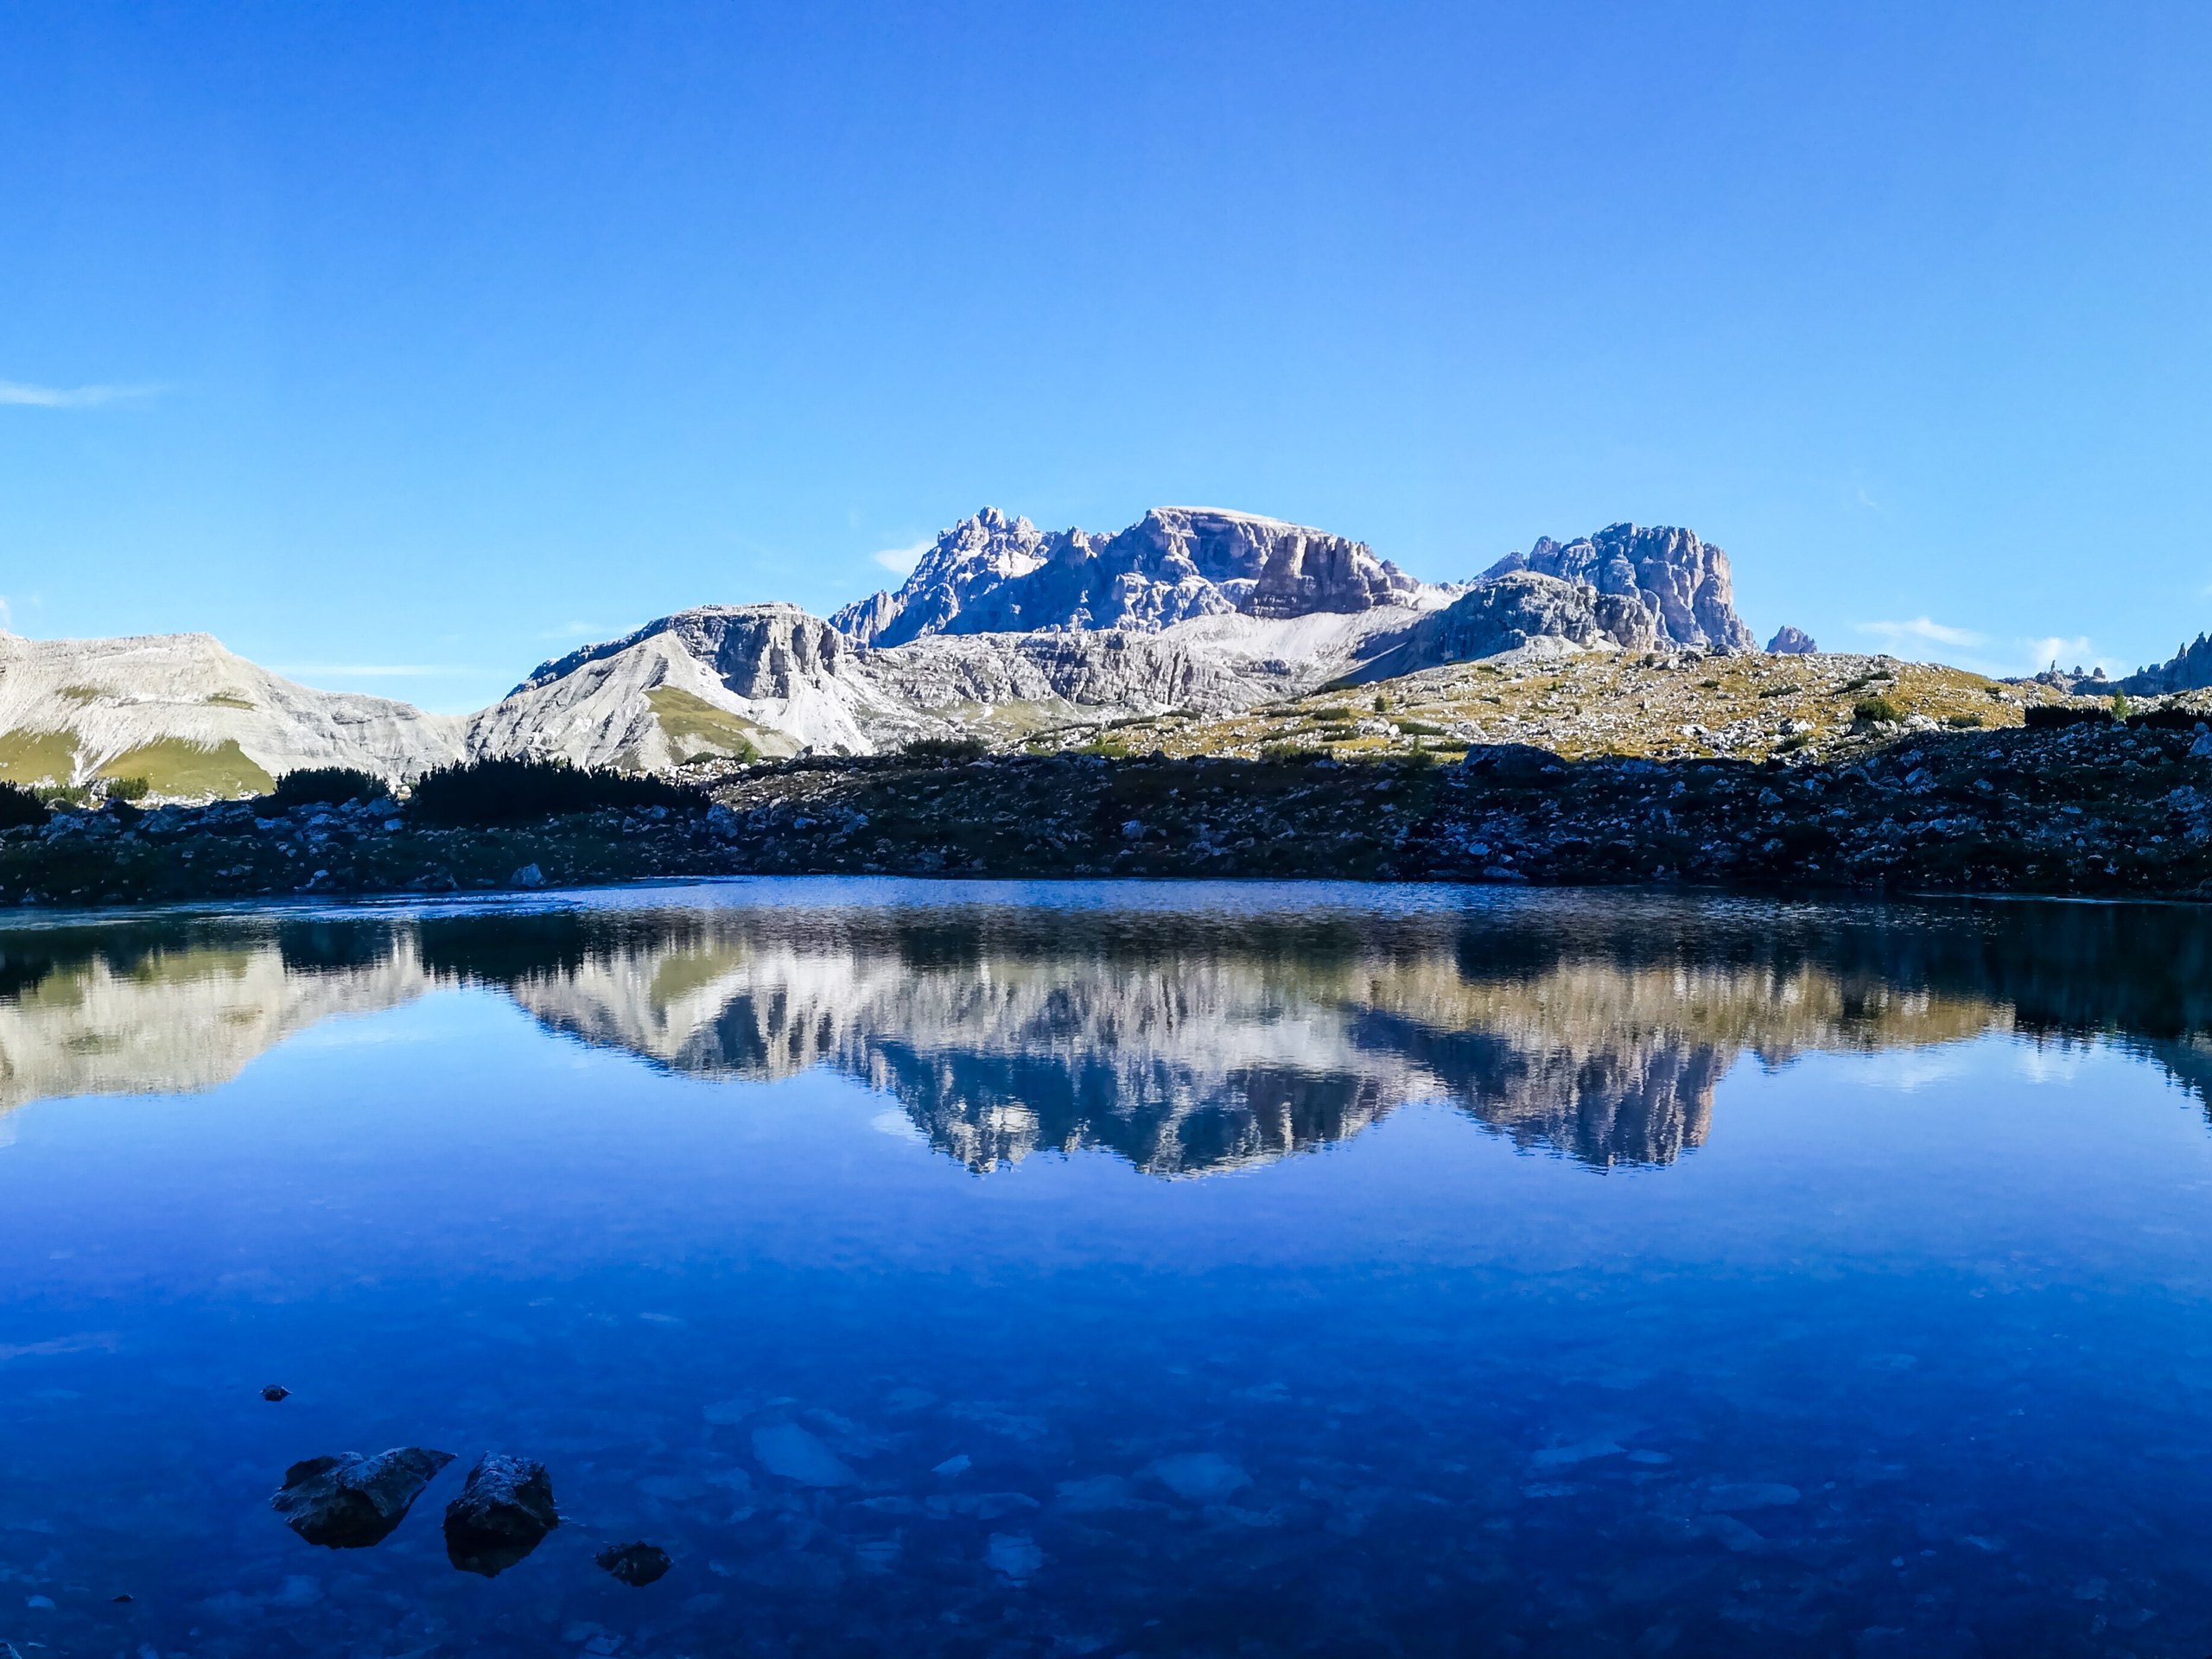 Mountain over the lake